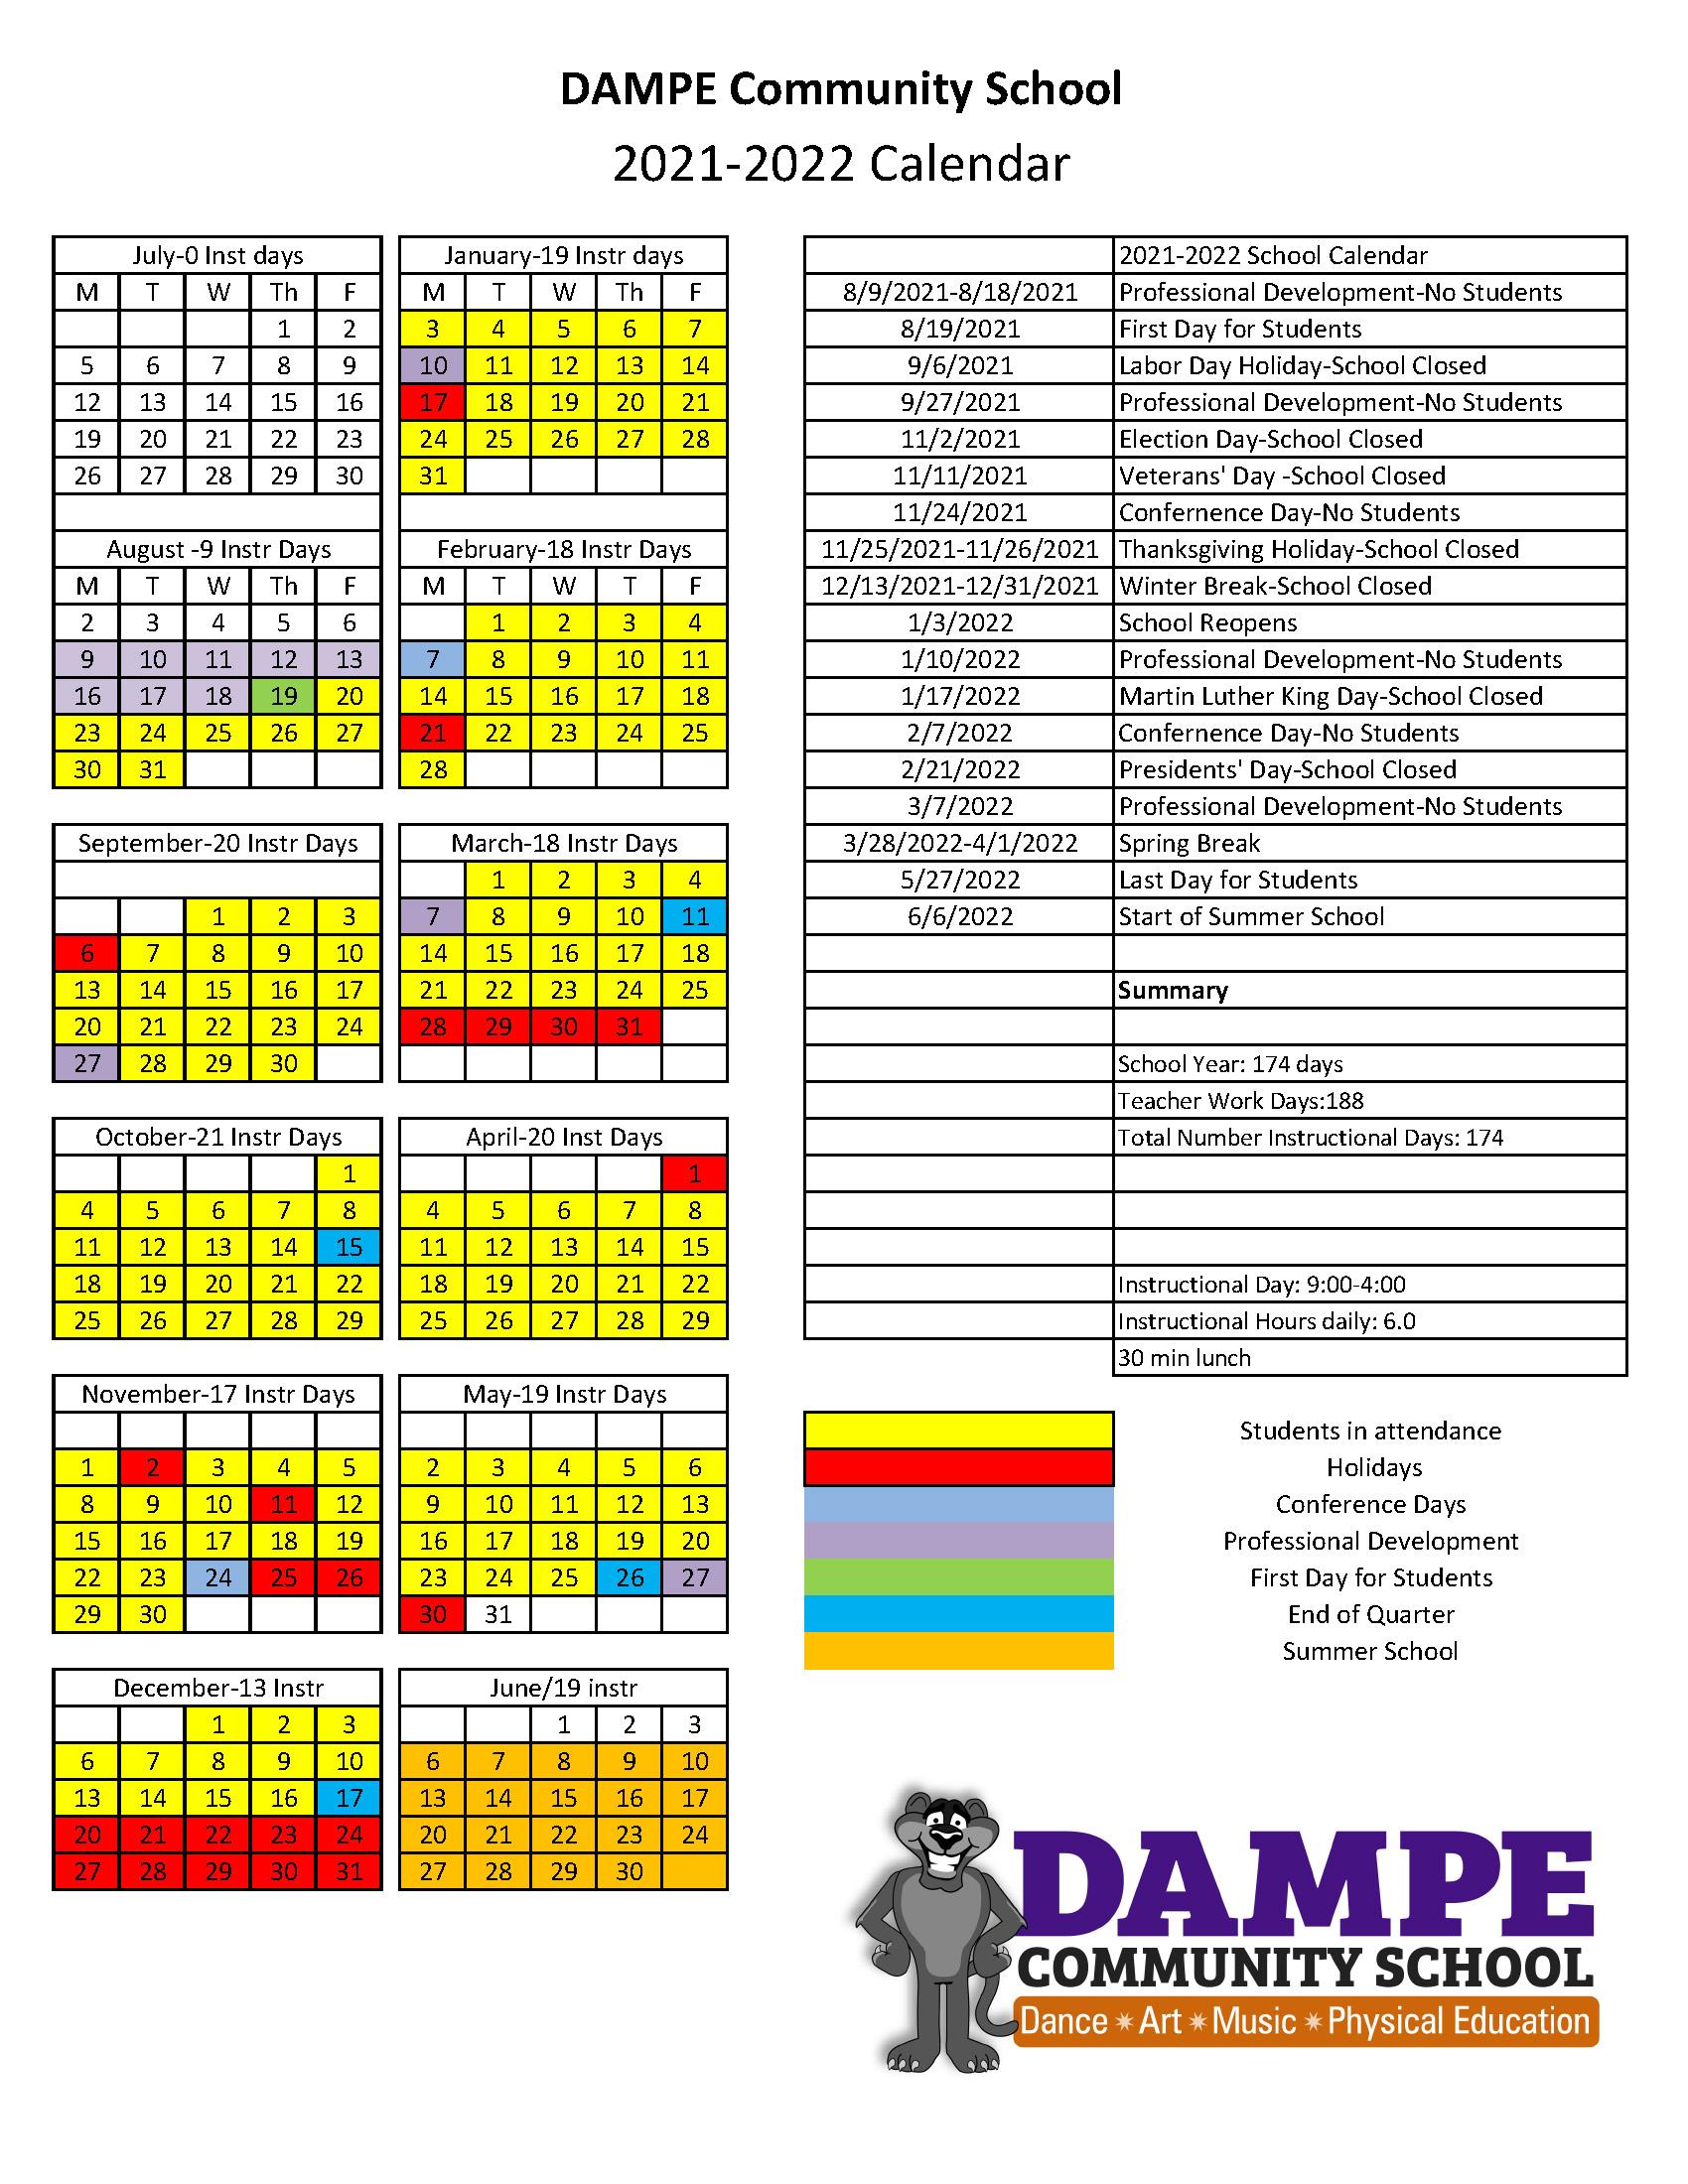 DAMPE School Calendar 2021_2022 copy